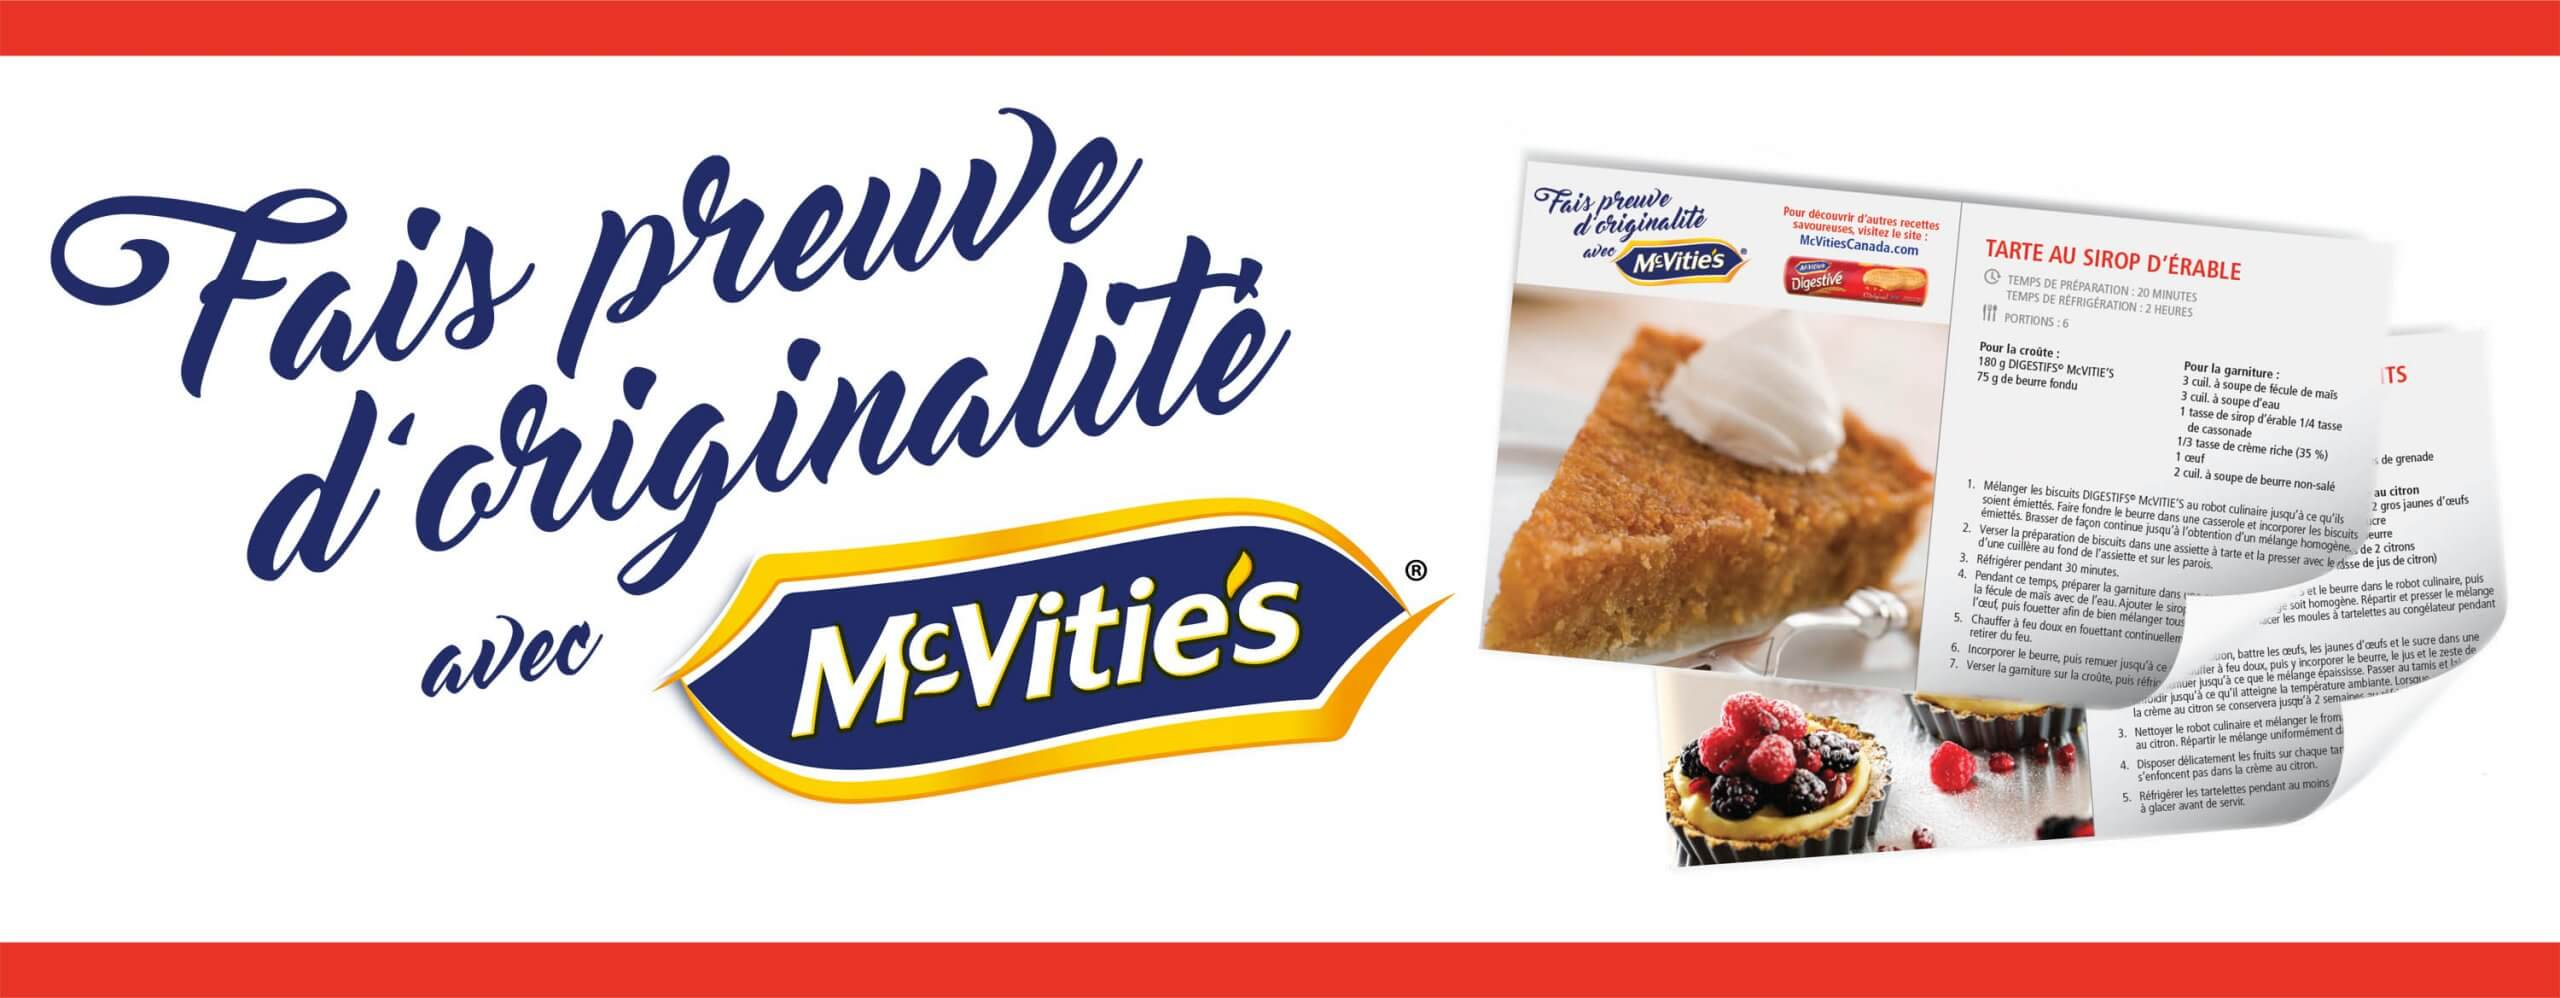 mcvities-get-creative-fr